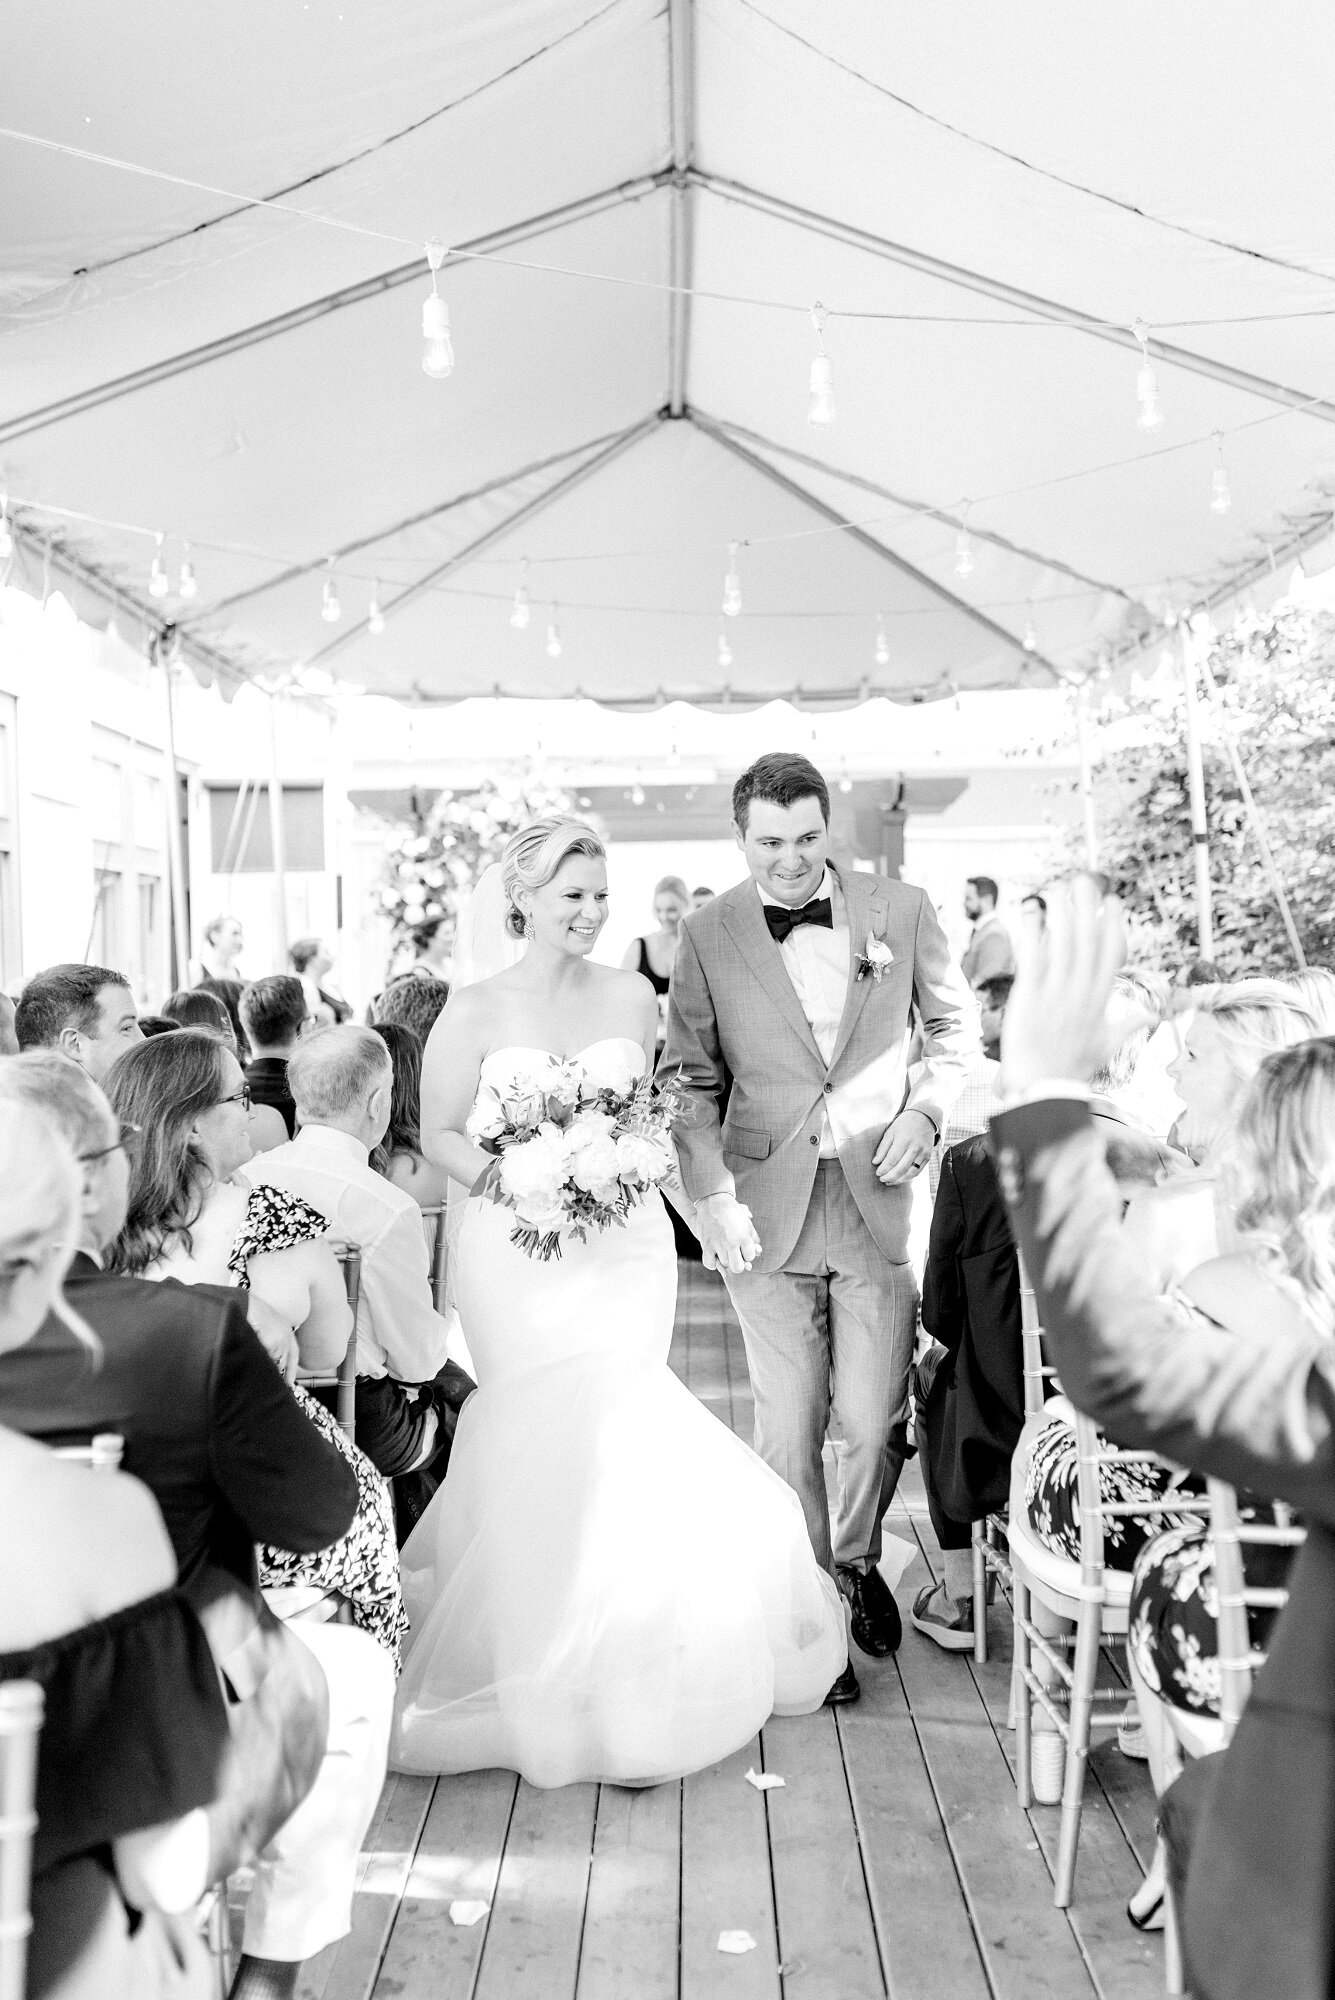 berkeley-field-house-wedding-kj-and-co-20.jpg